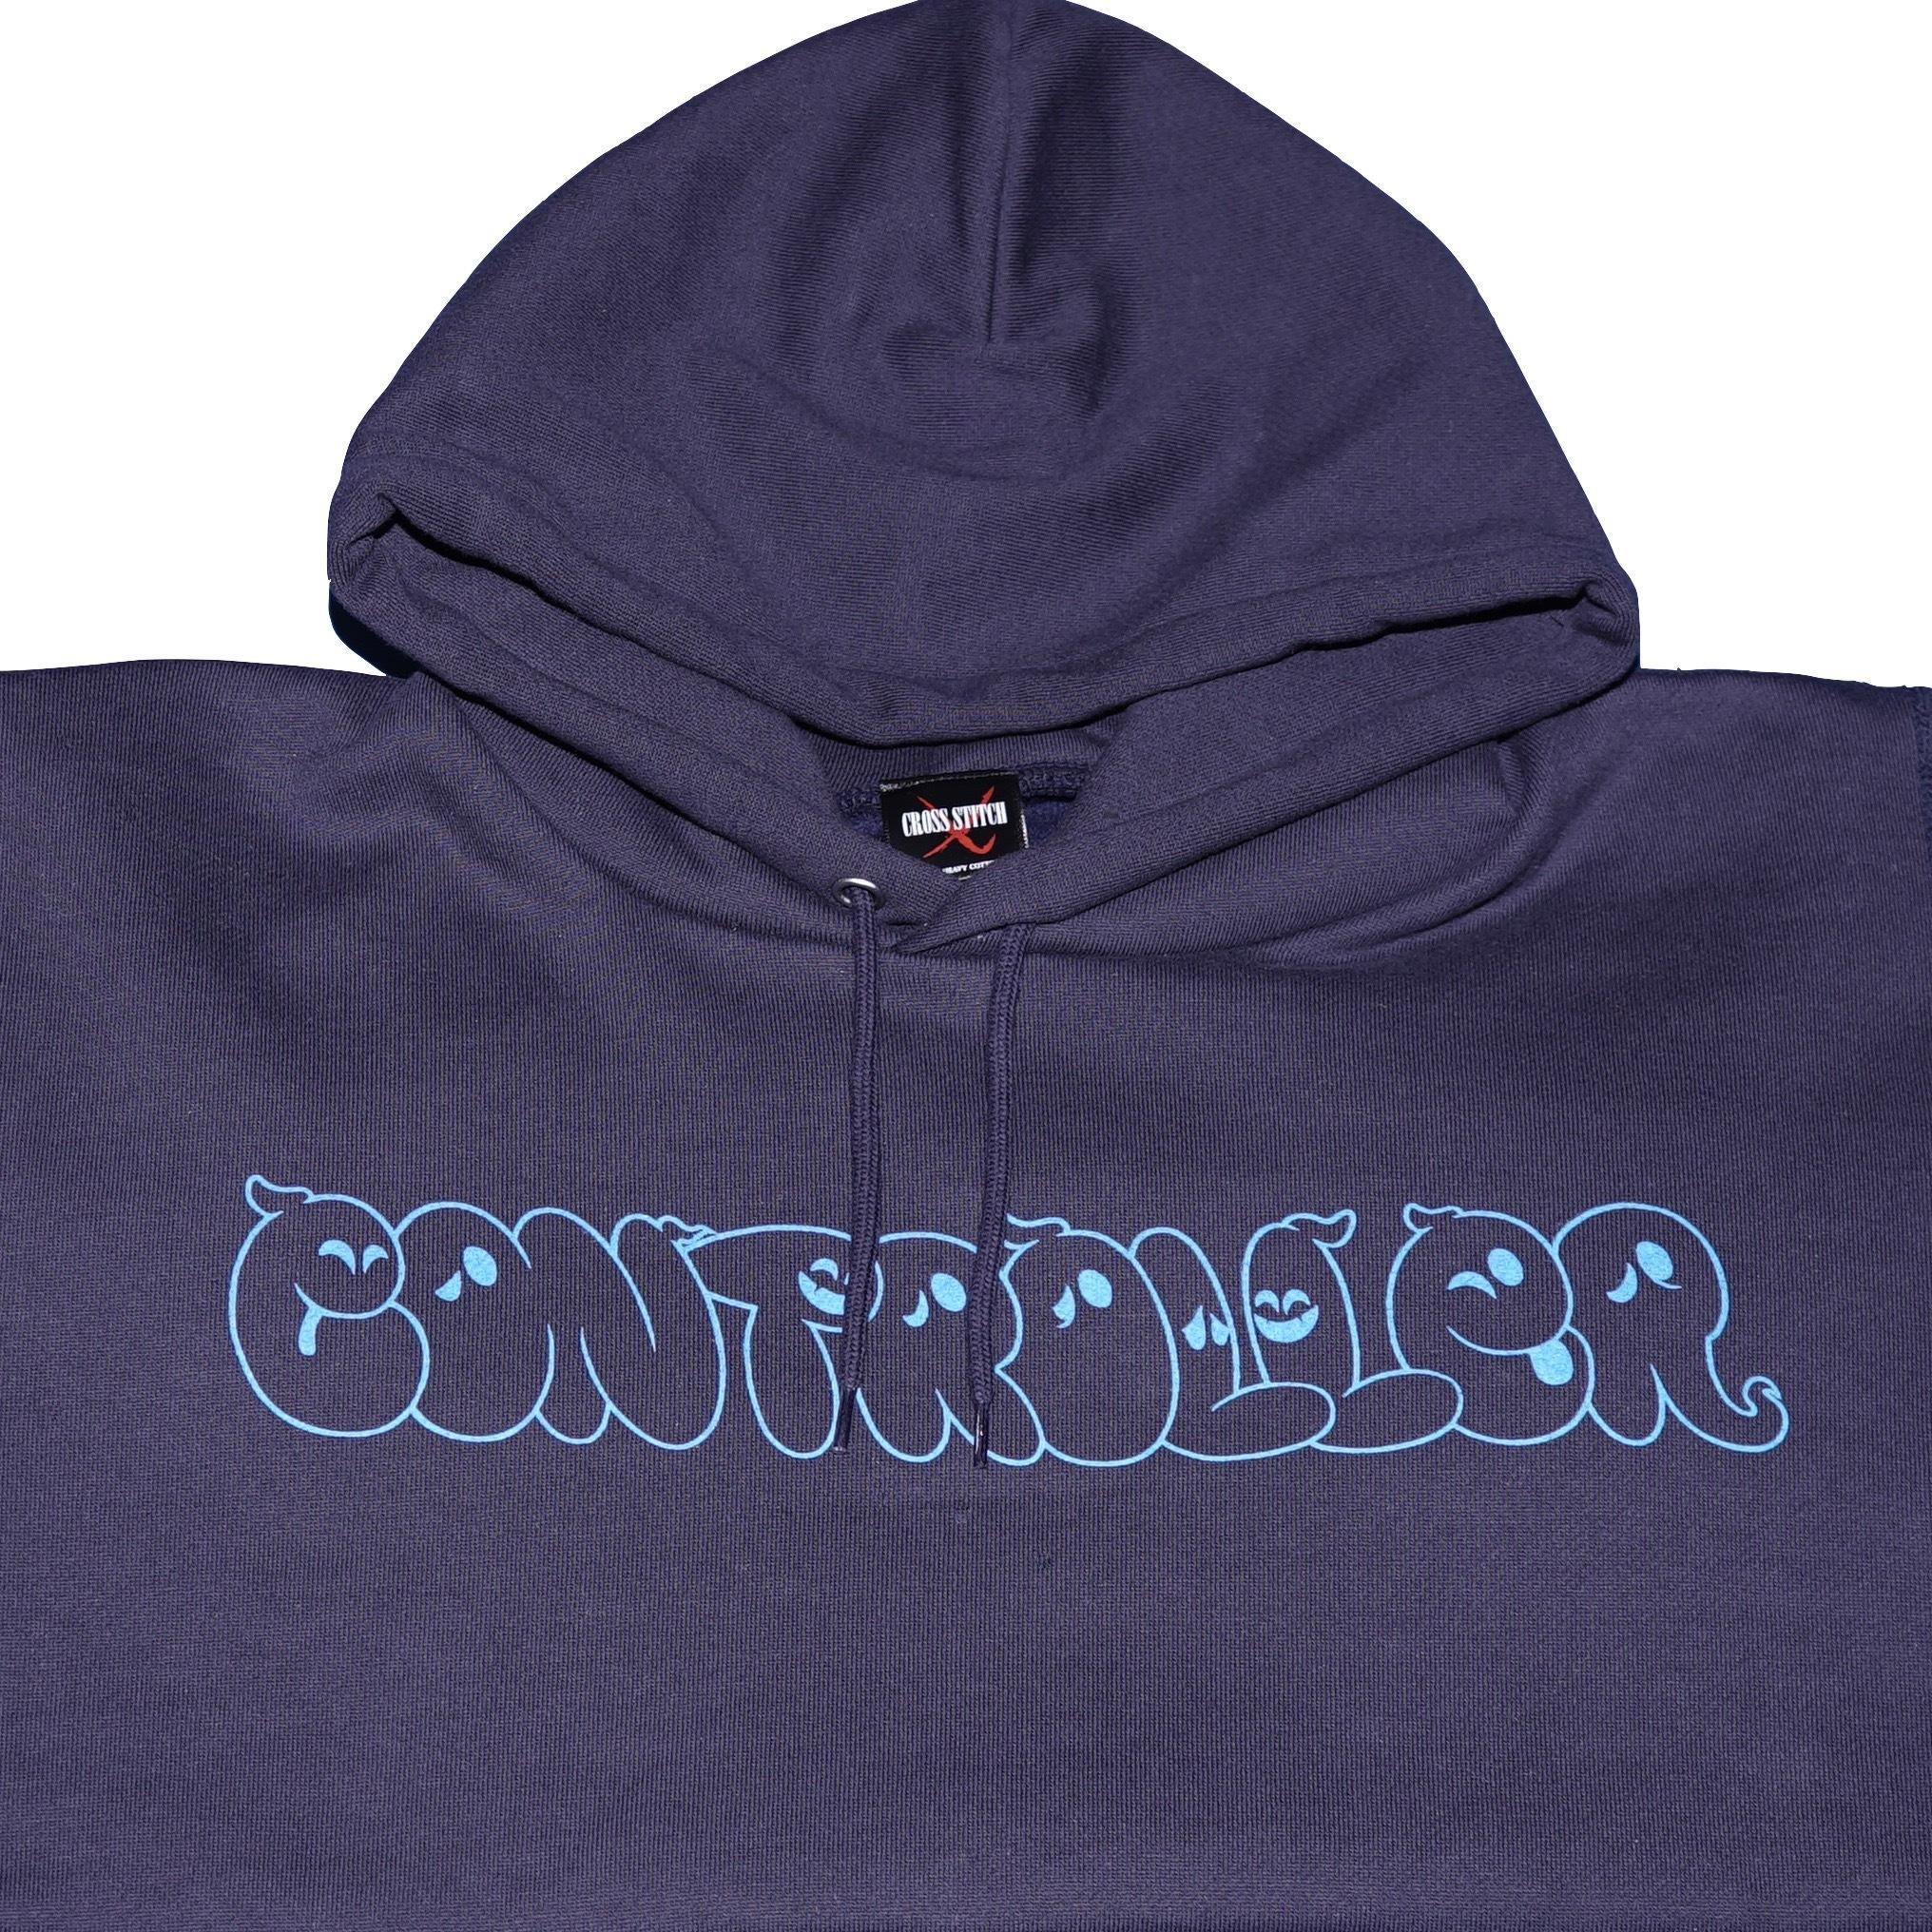 CONTROLLER / コントローラー ロゴ パーカー (ネイビー)